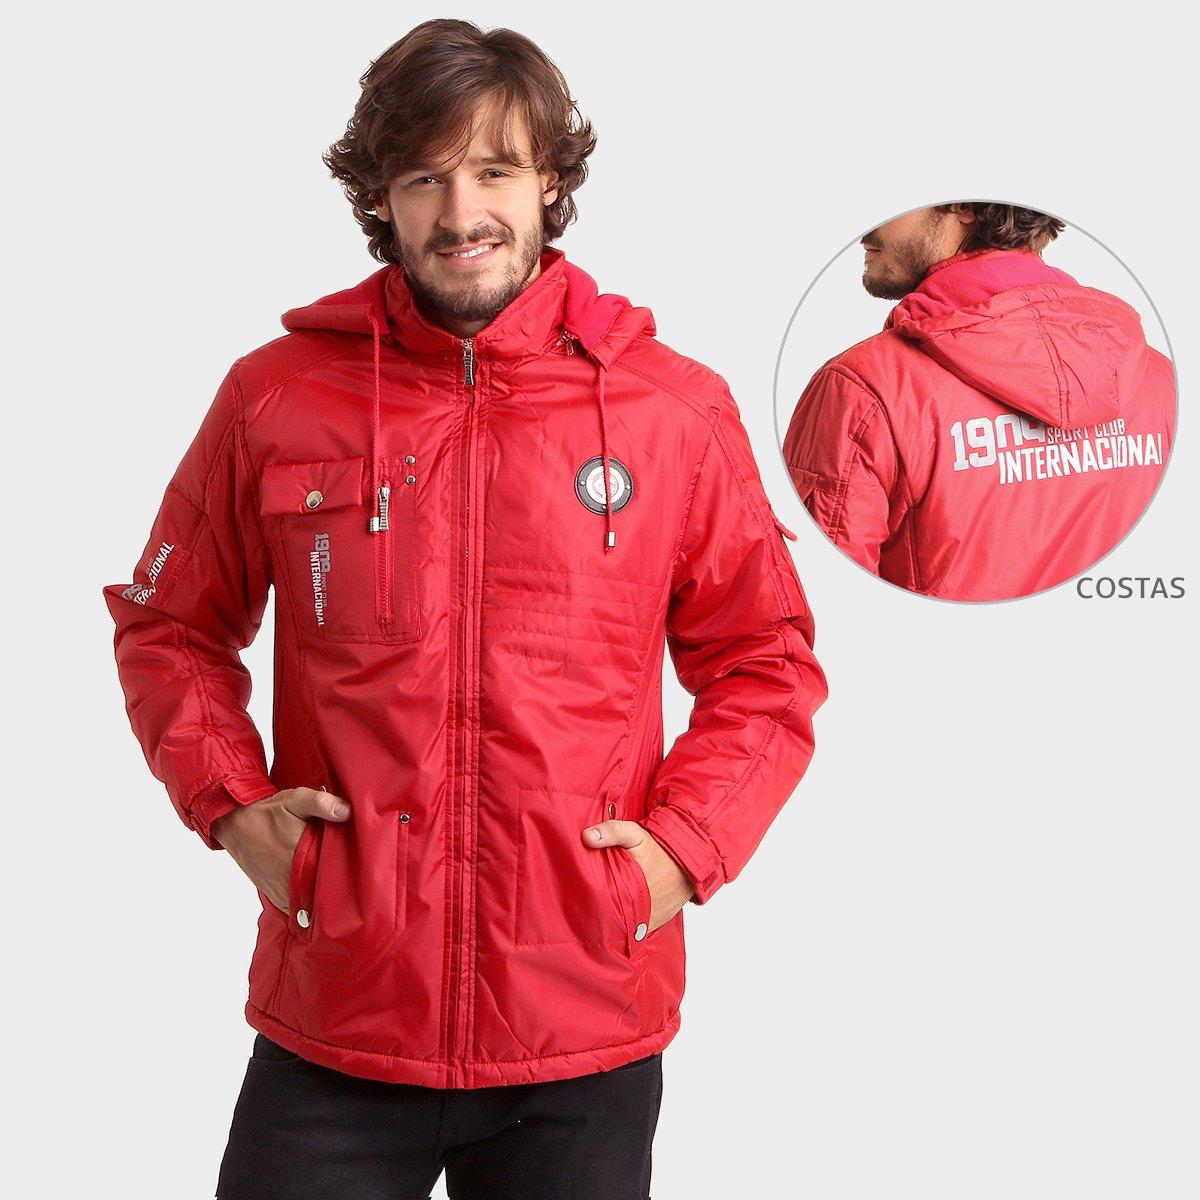 ec2129fdaa367 Jaqueta Internacional 1 - Compre Agora